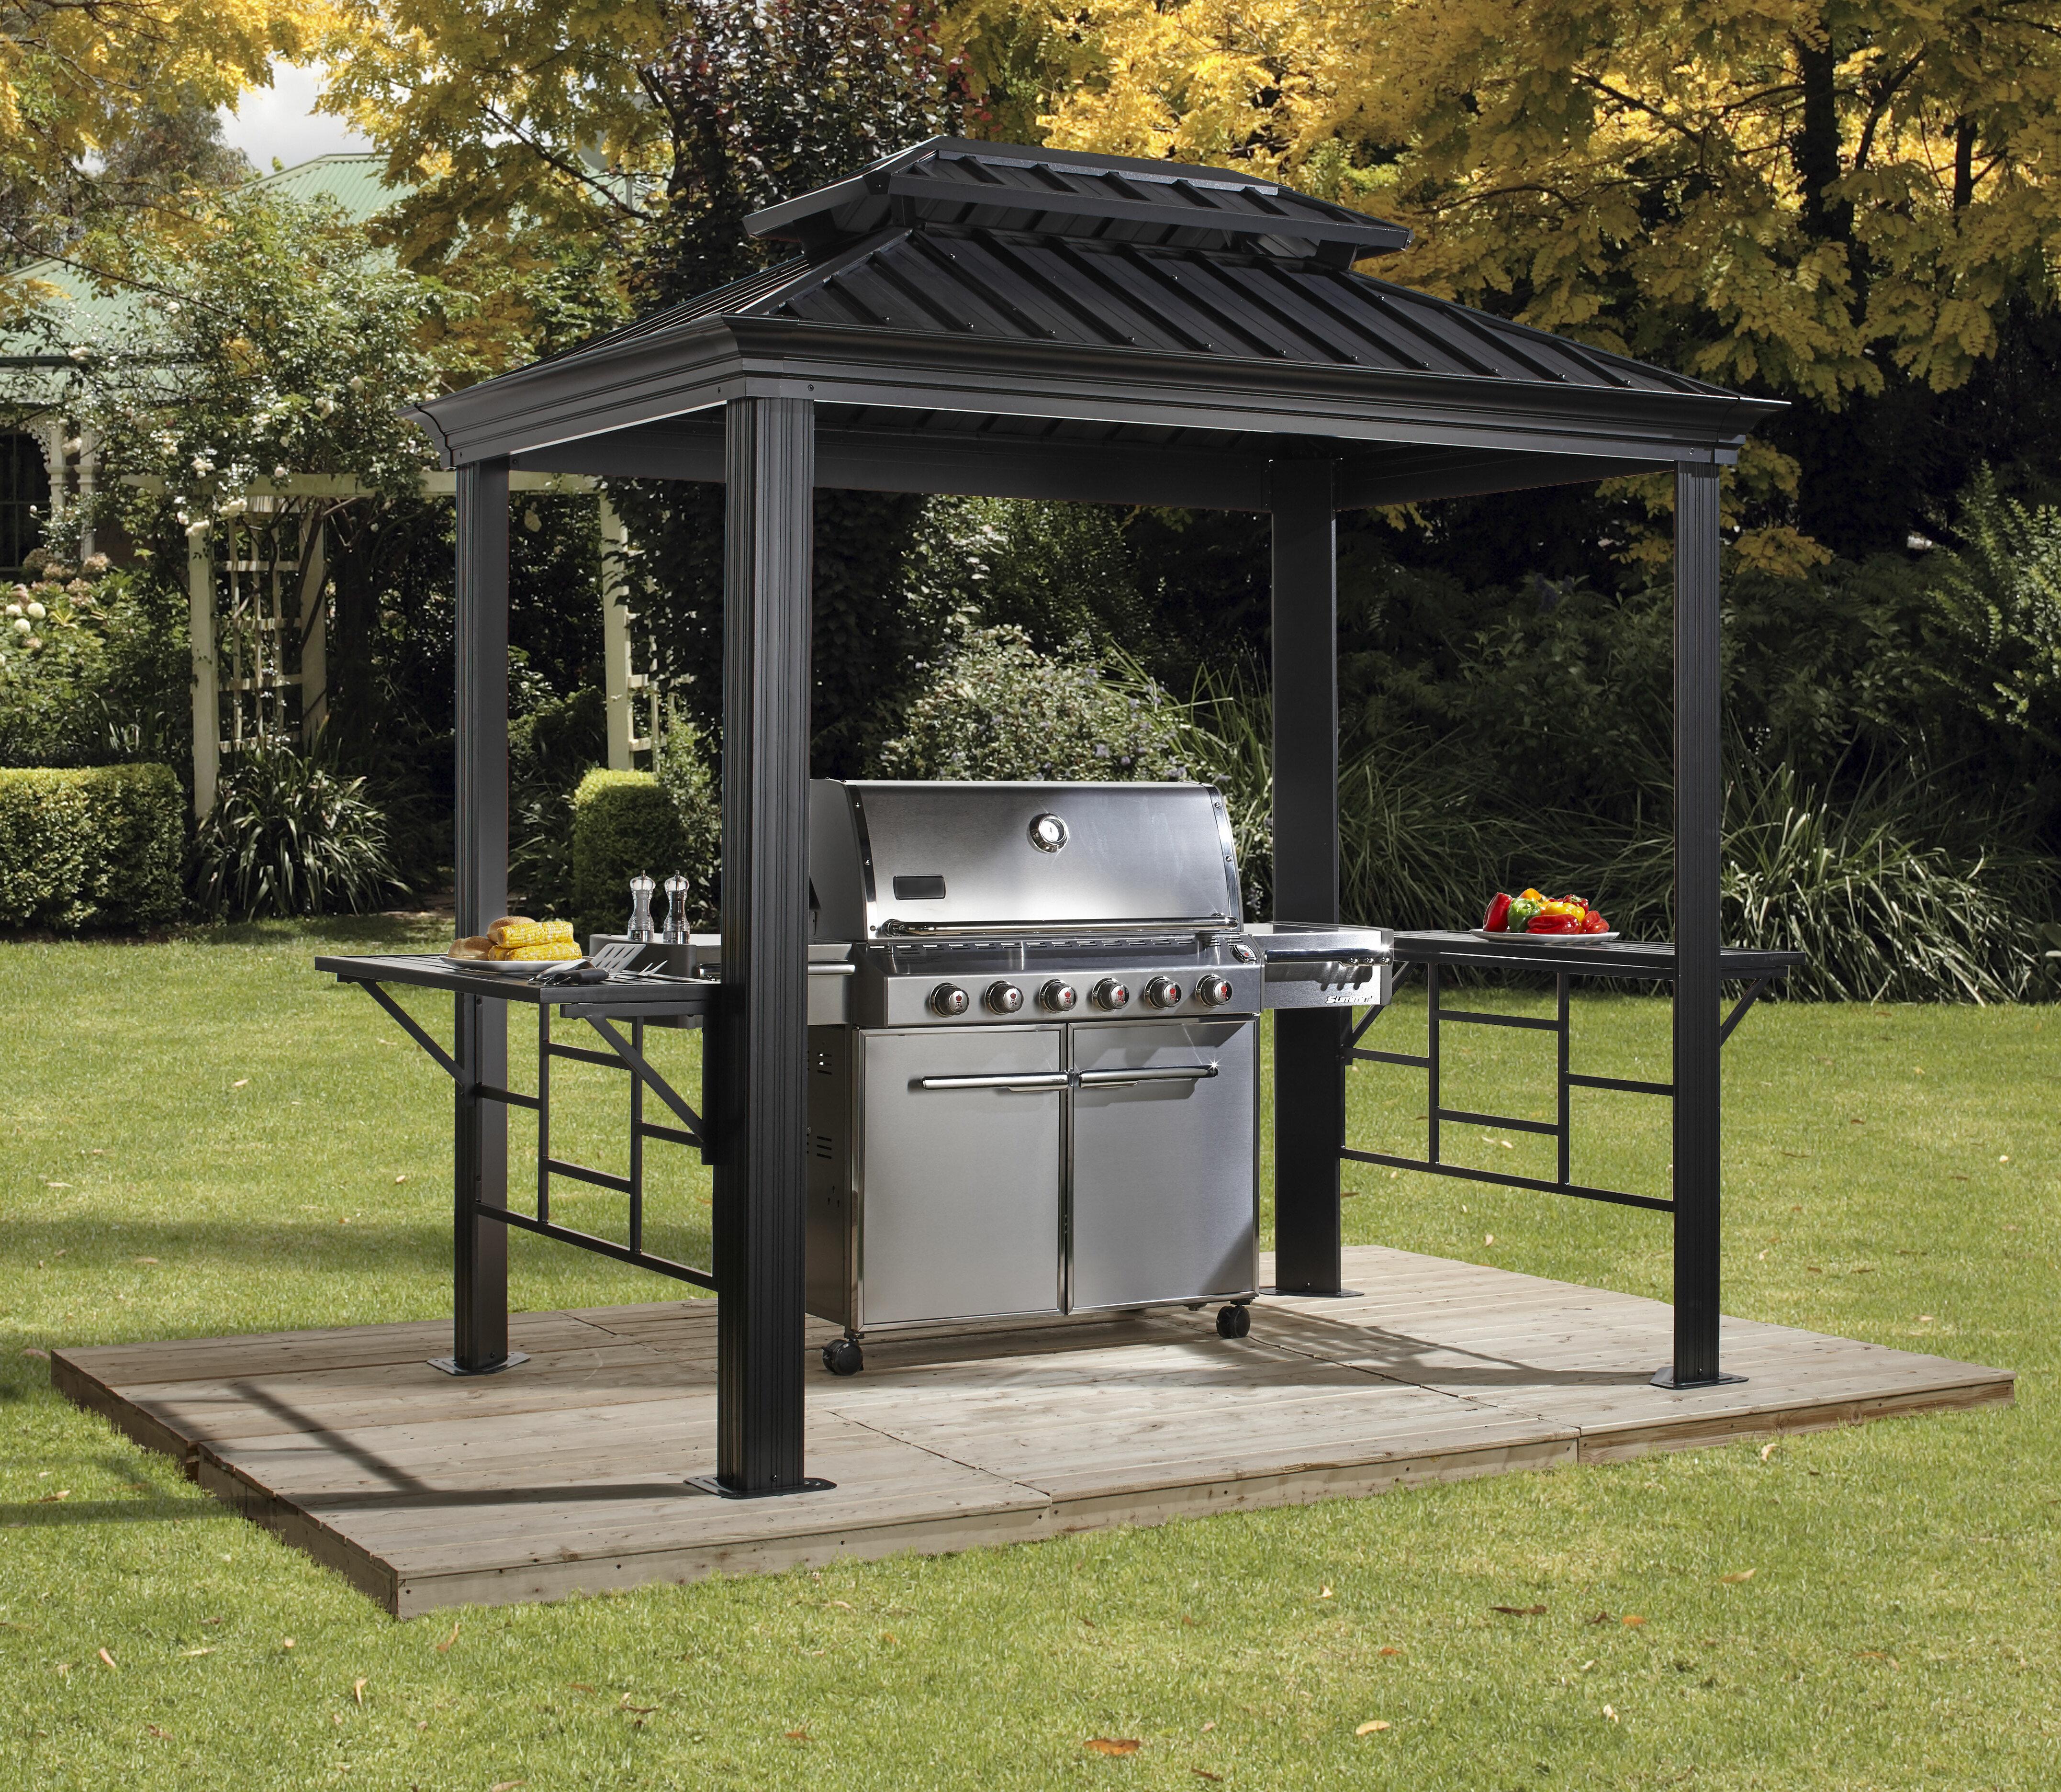 Sojag BBQ Messina 8 Ft. W x 6 Ft. D Aluminum Grill Gazebo u0026 Reviews | Wayfair & Sojag BBQ Messina 8 Ft. W x 6 Ft. D Aluminum Grill Gazebo ...